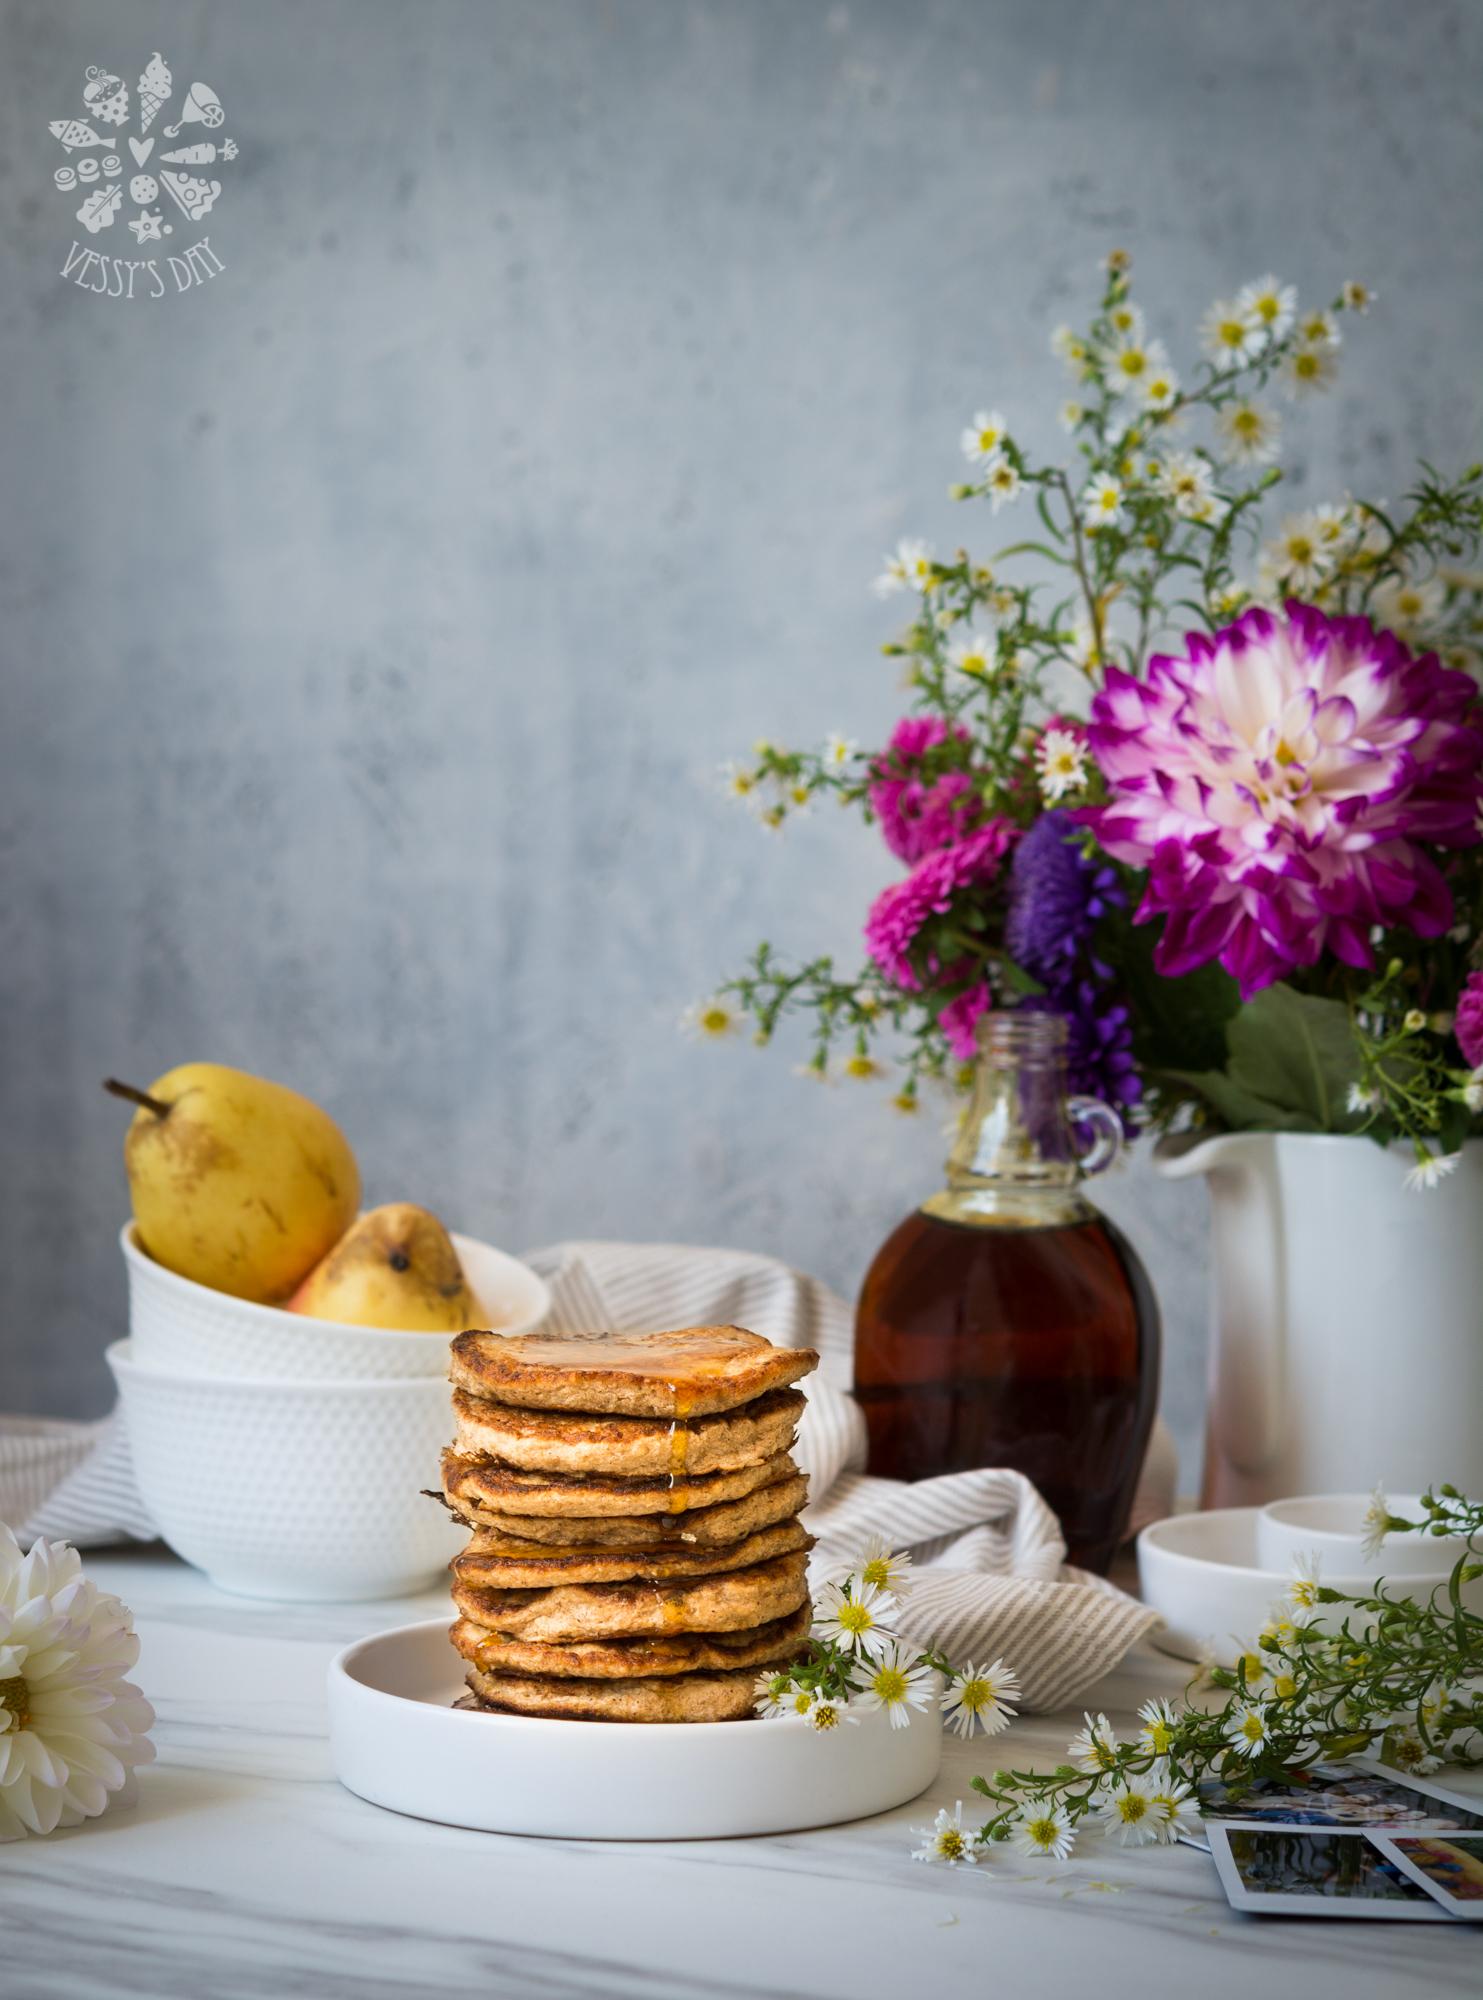 Healthy banana pancakes (gluten free) | Vessy\'s day